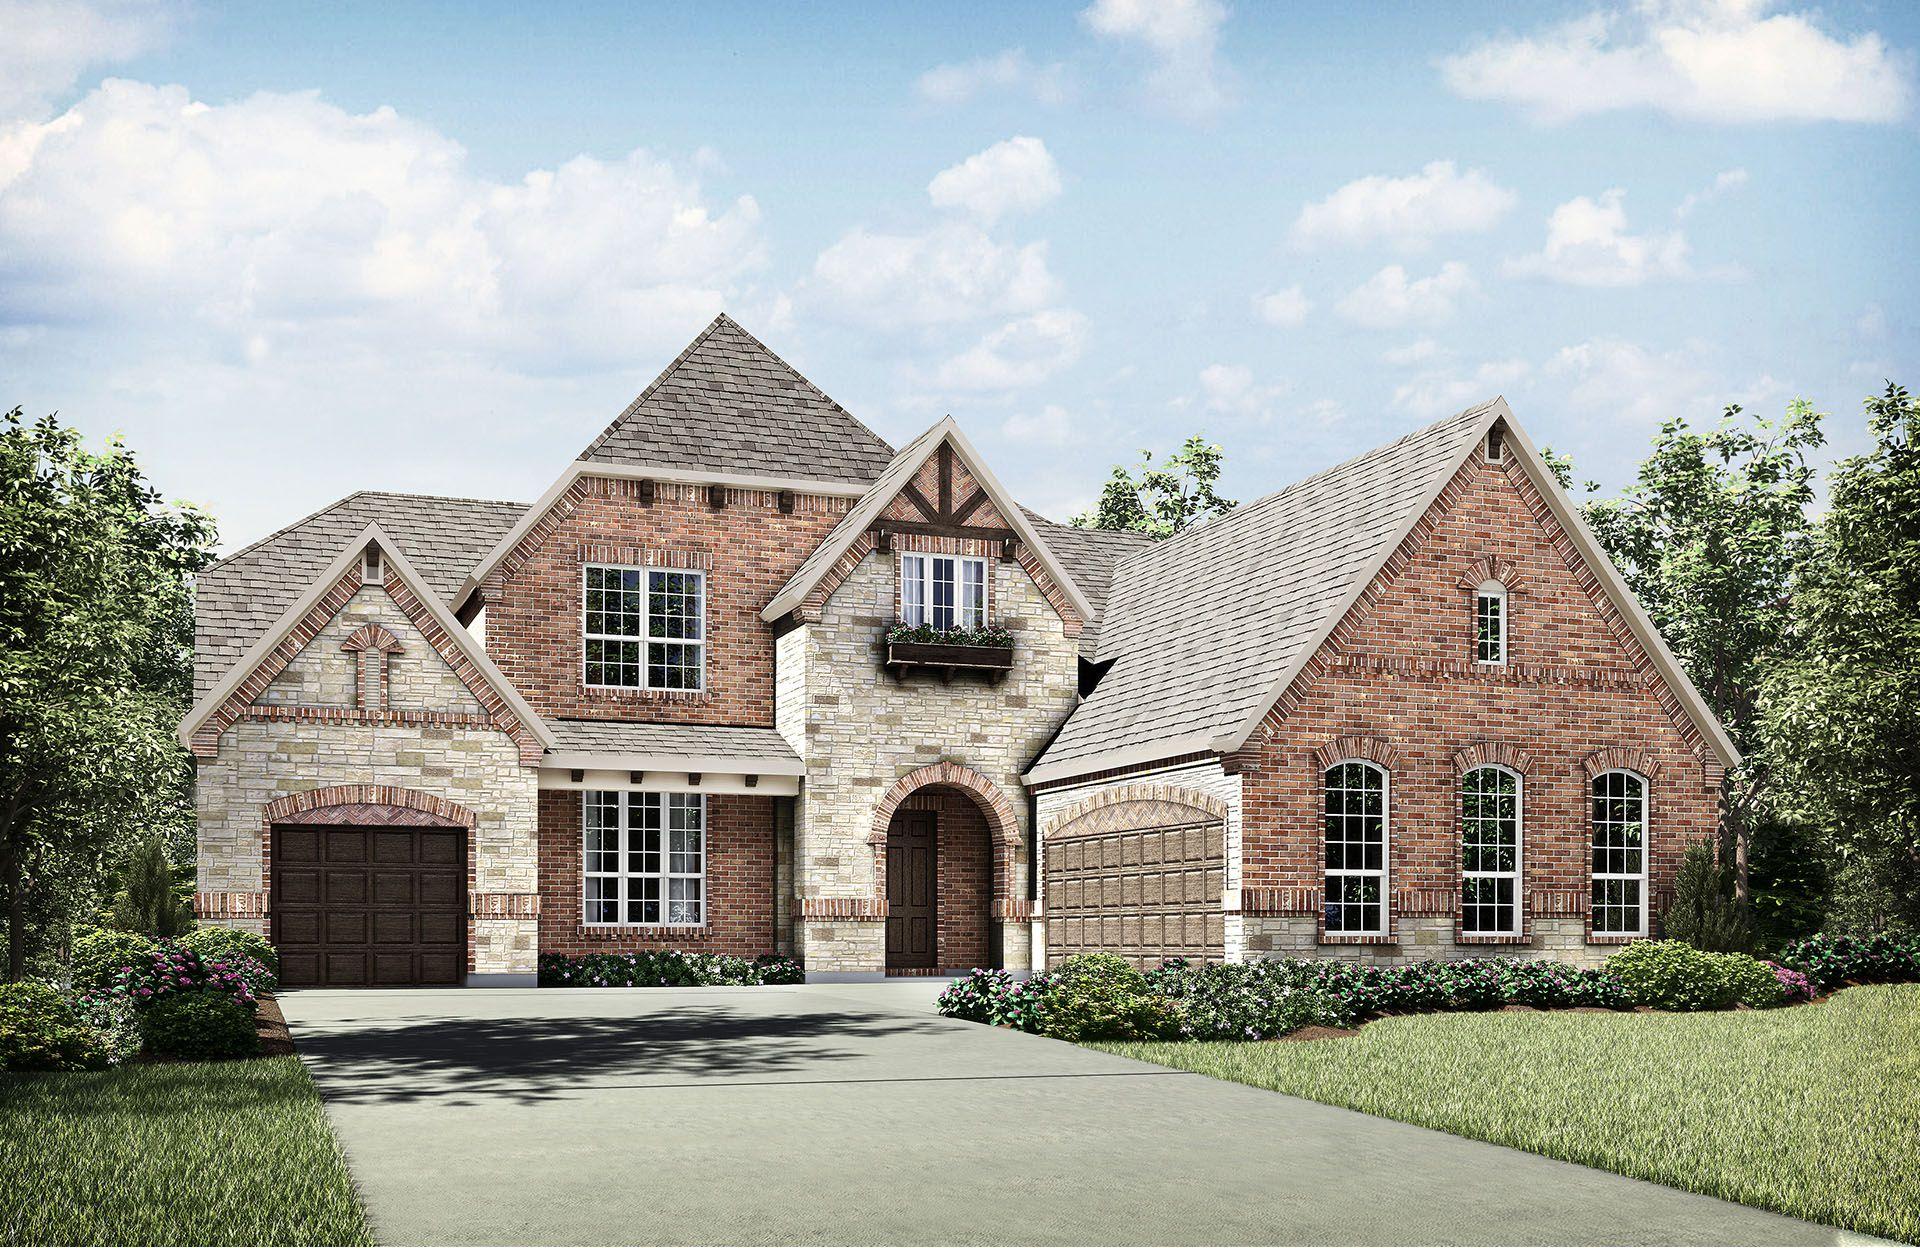 Single Family for Sale at Viridian - Brinkley 1344 Viridian Park Lane Arlington, Texas 76005 United States